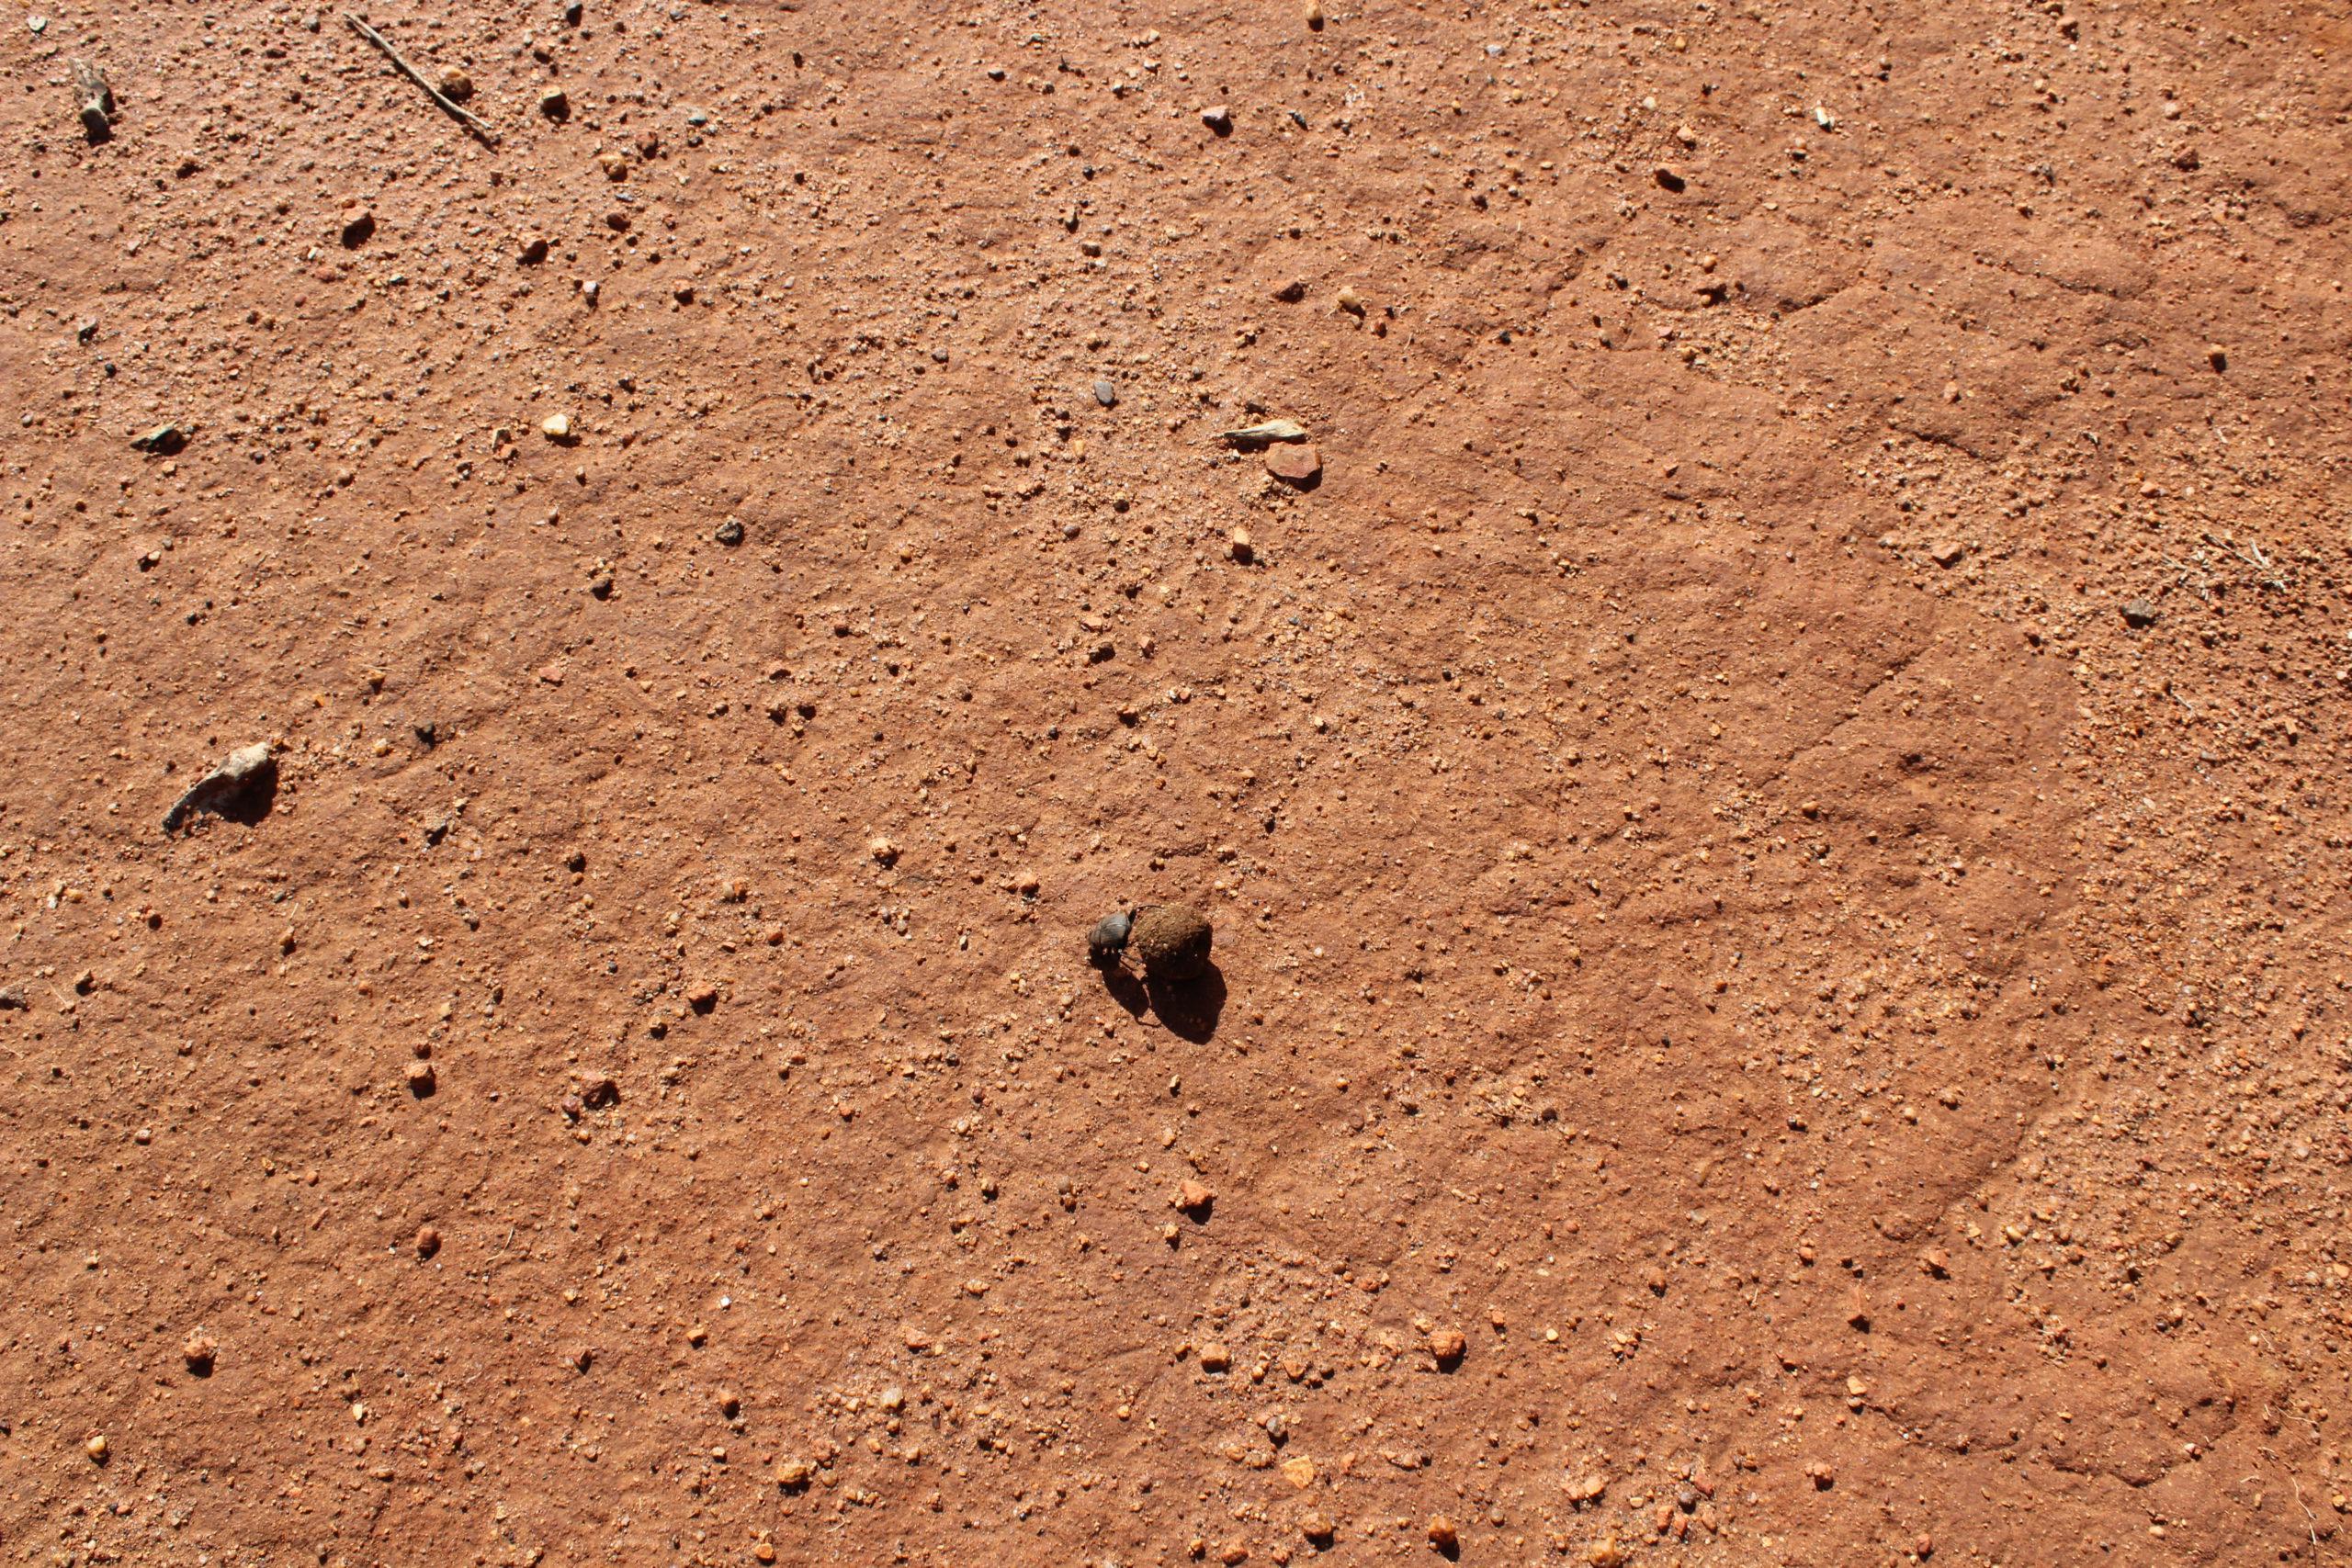 Dung beetle at work in Madikwe Game Reserve